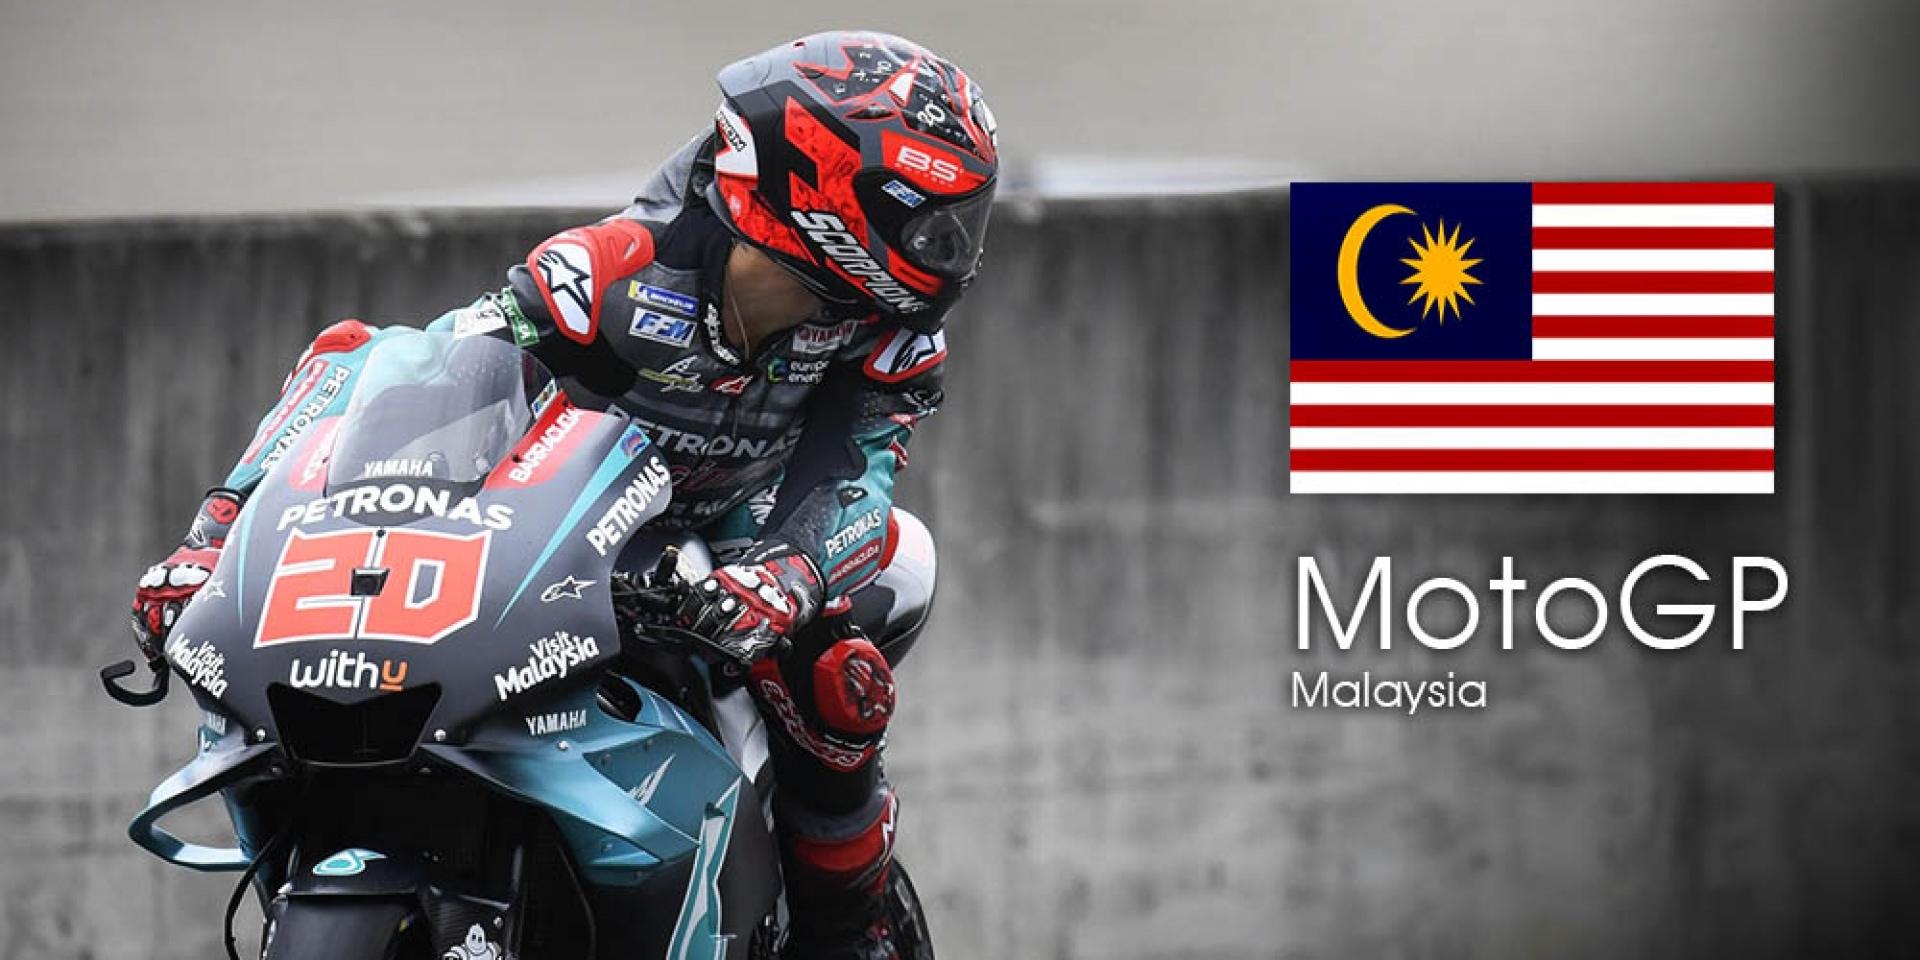 MotoGP 2019 馬來西亞站 轉播時間   SUPERMOTO8